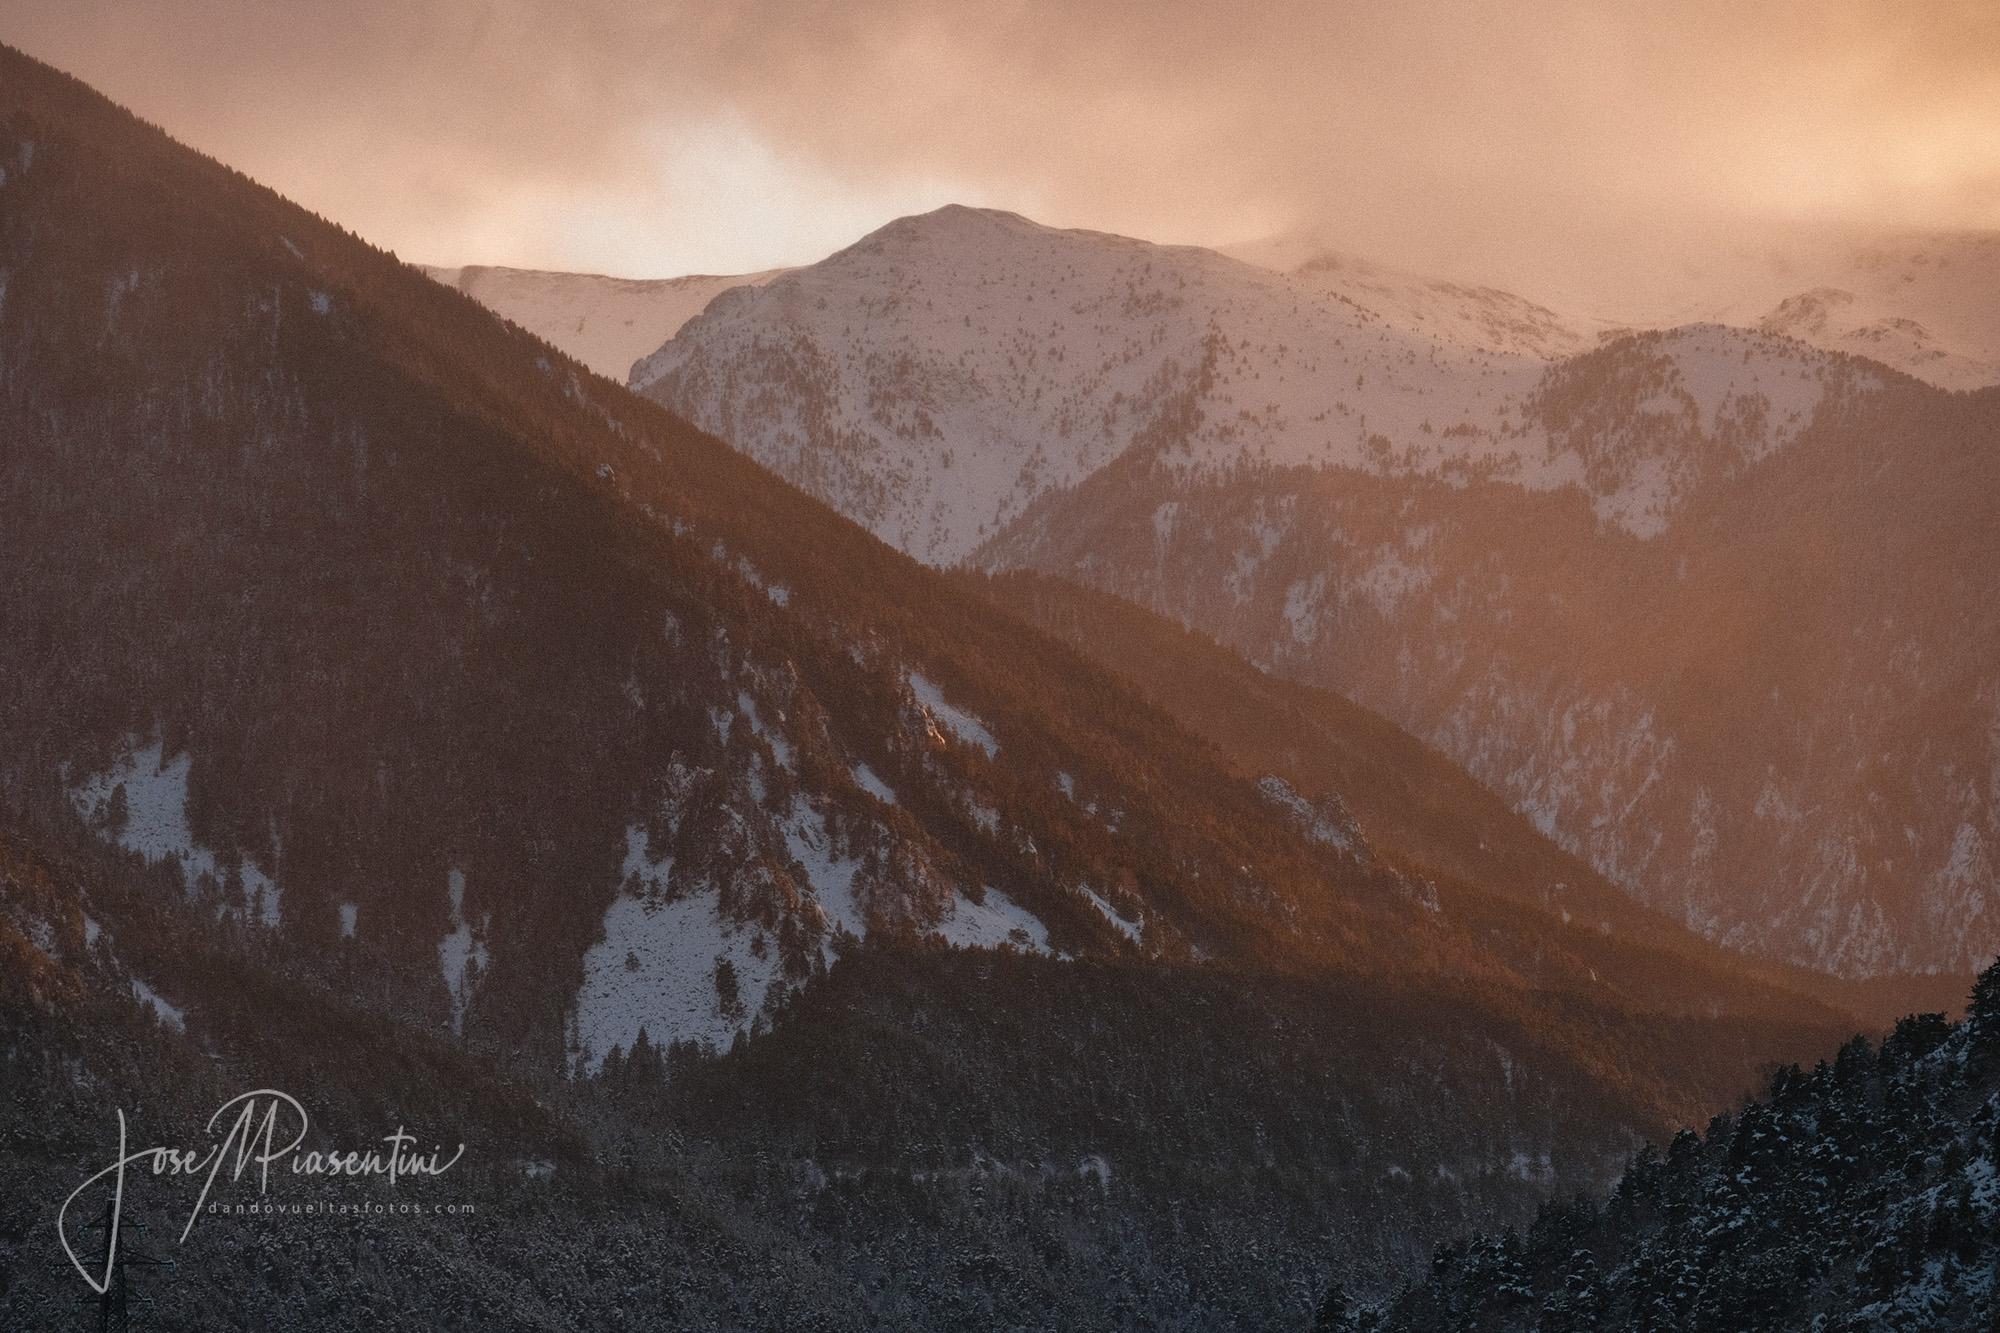 Andorra Les Pardines